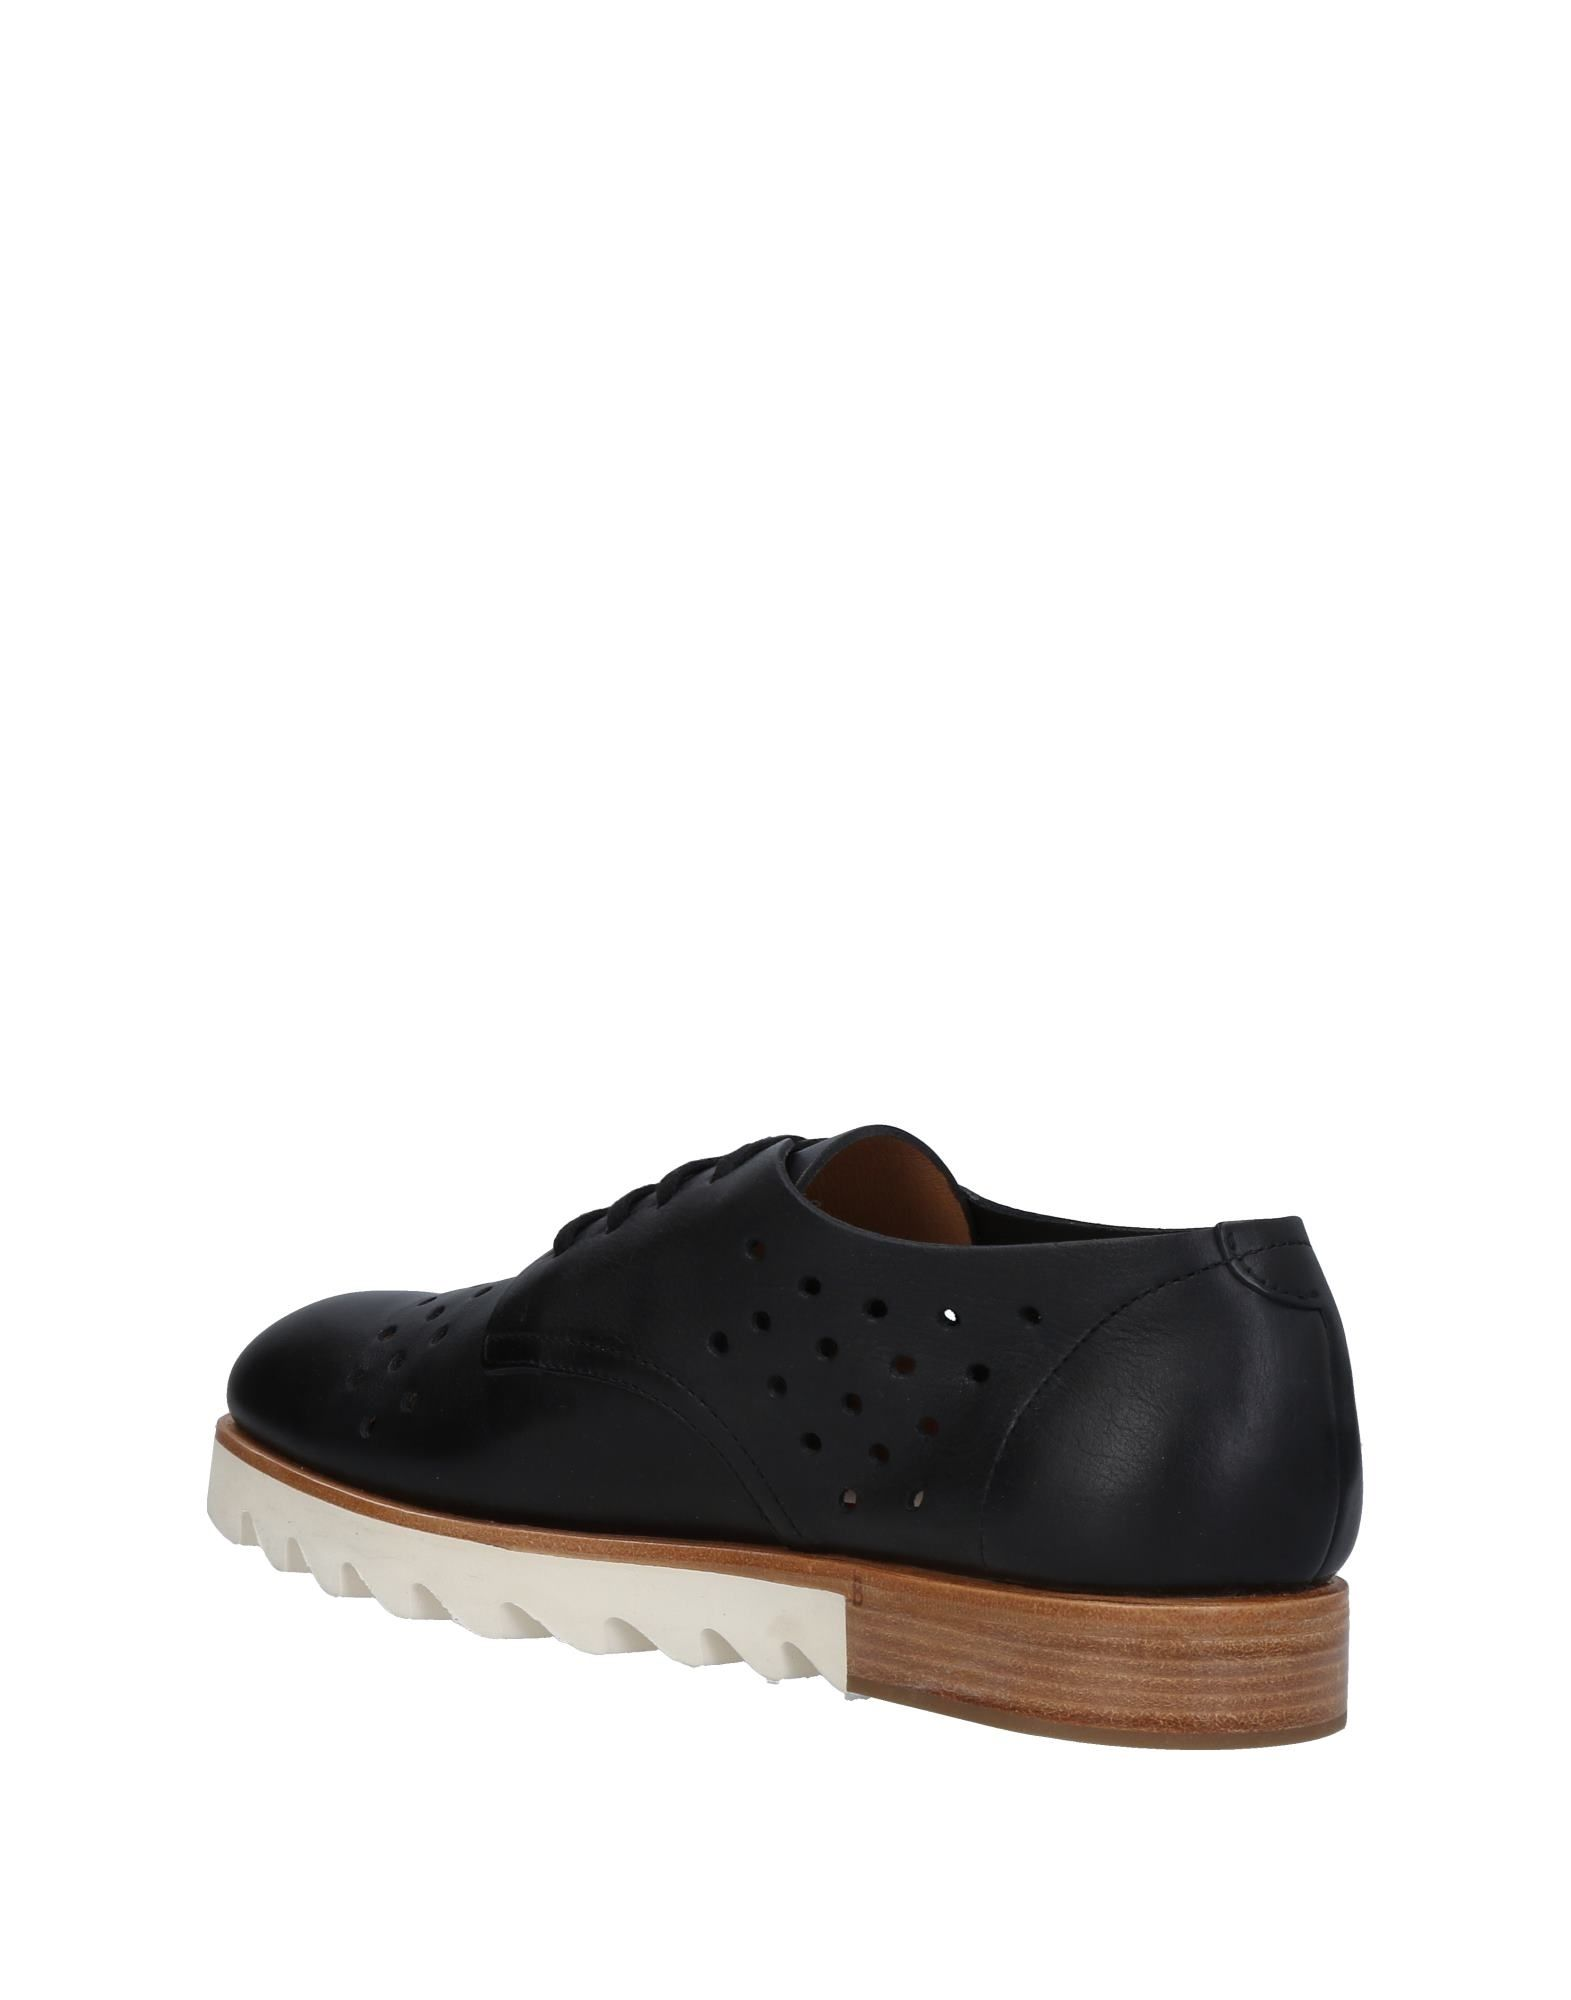 Haltbare Mode billige Schuhe Barracuda Schnürschuhe Damen  11416096QE Heiße Schuhe